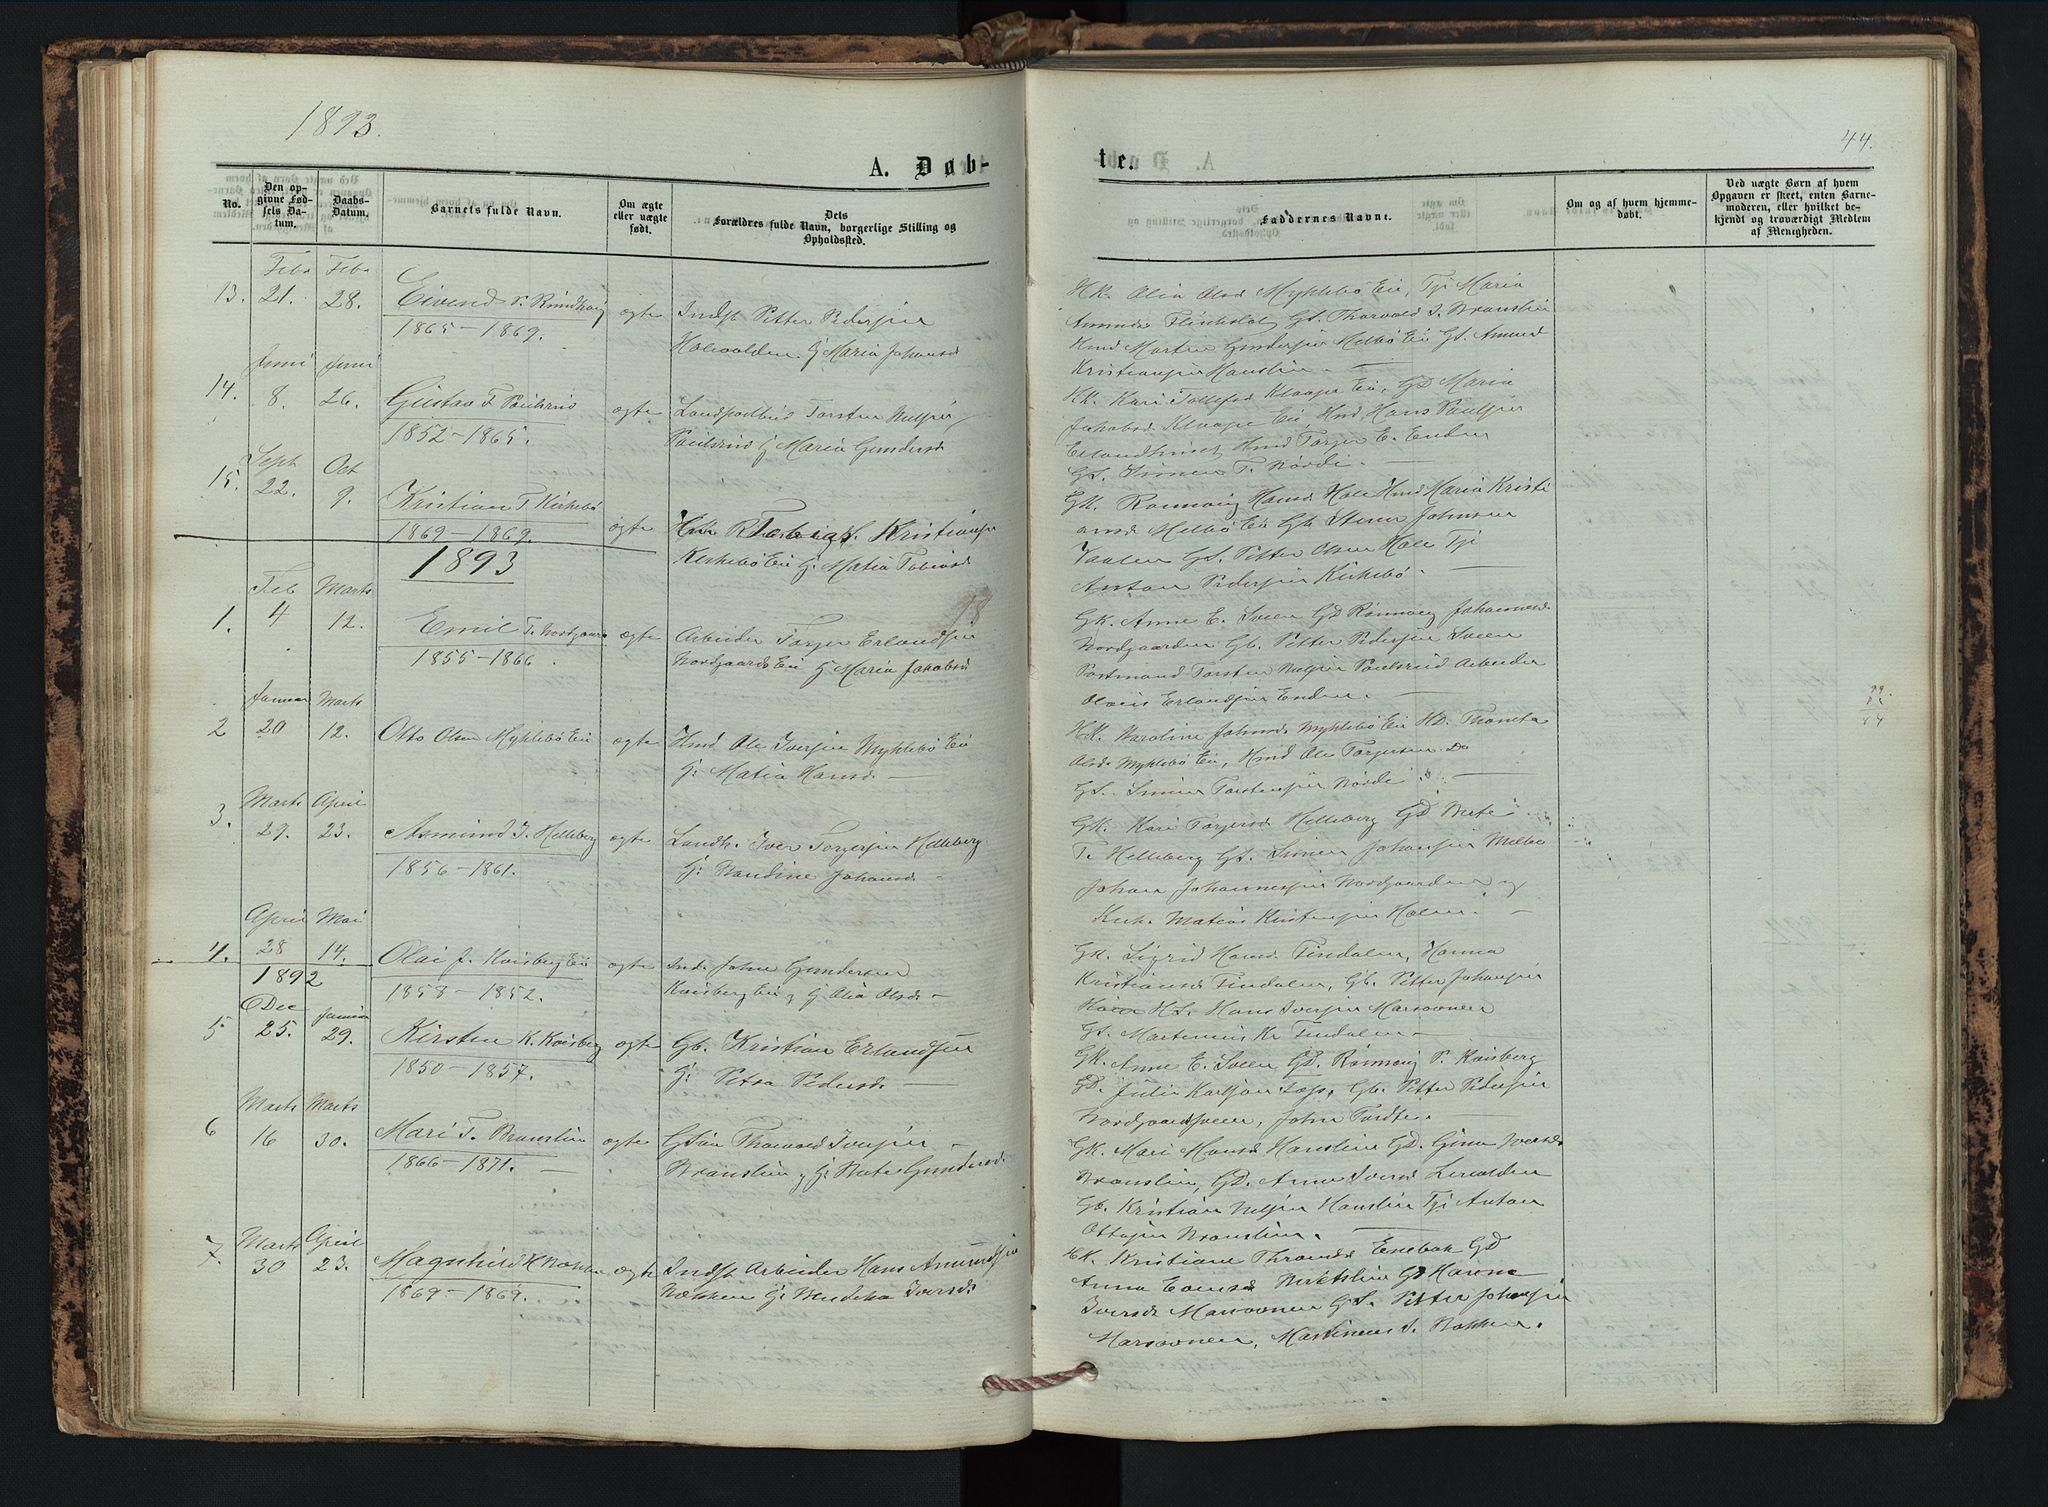 SAH, Vestre Gausdal prestekontor, Klokkerbok nr. 2, 1874-1897, s. 44